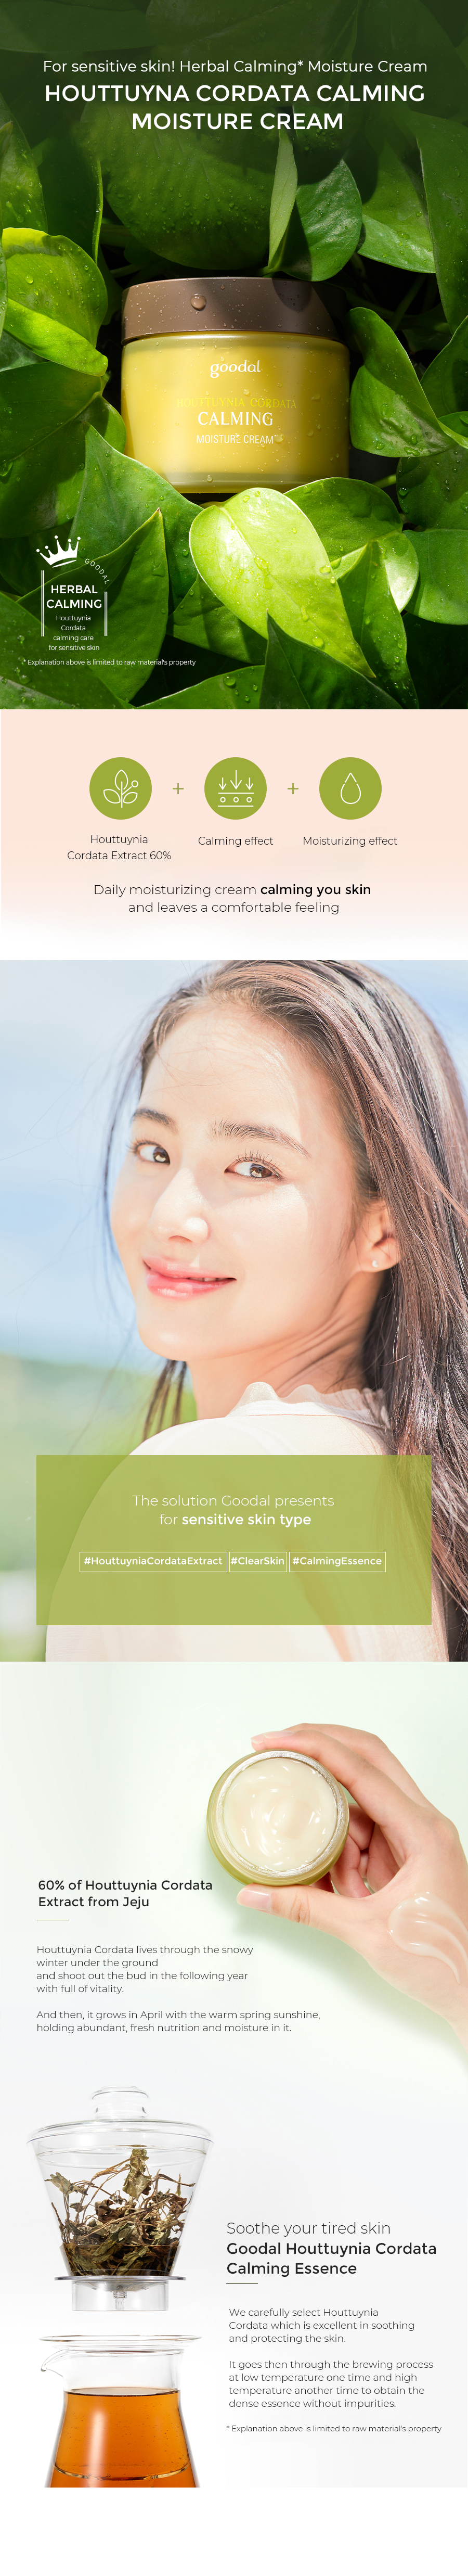 [Goodal] Houttuynia Cordata Calming Moisture Cream 75ml